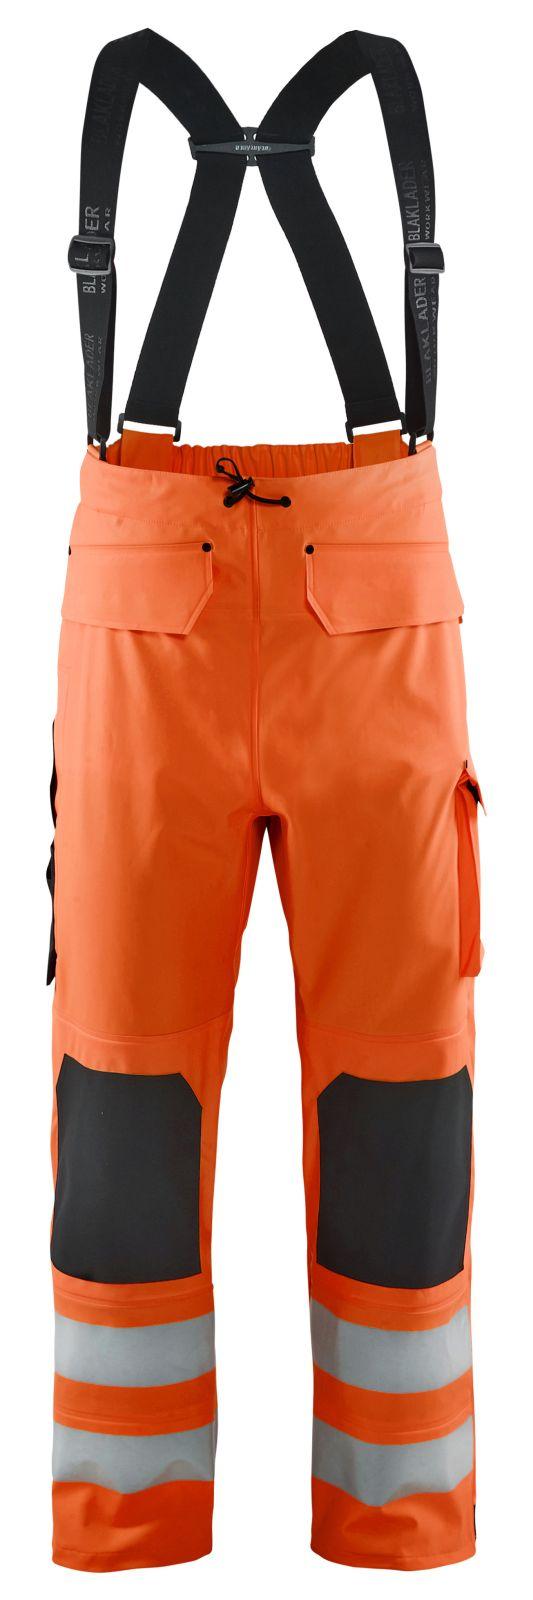 Blaklader Broeken 13062005 High Vis fluo-oranje(5300)